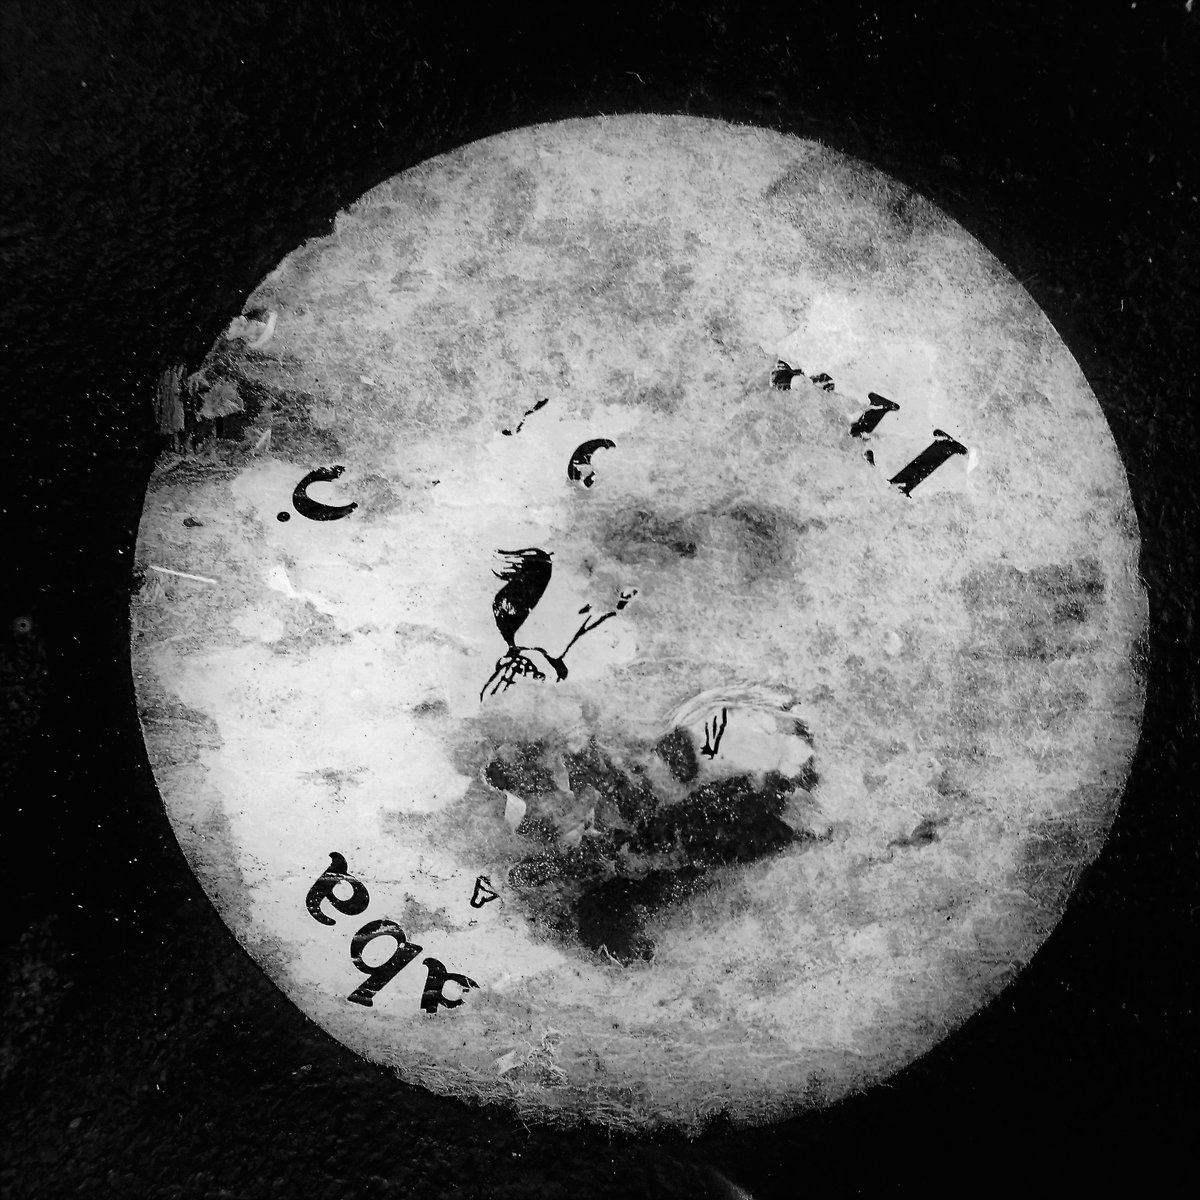 Moon on Table (2017) (c) r. f. kenter #images #surreal #SolarEclipse2017  #blackandwhite #retrograde #mixedmedia #contemporaryart #collage<br>http://pic.twitter.com/z7dbkKScQQ